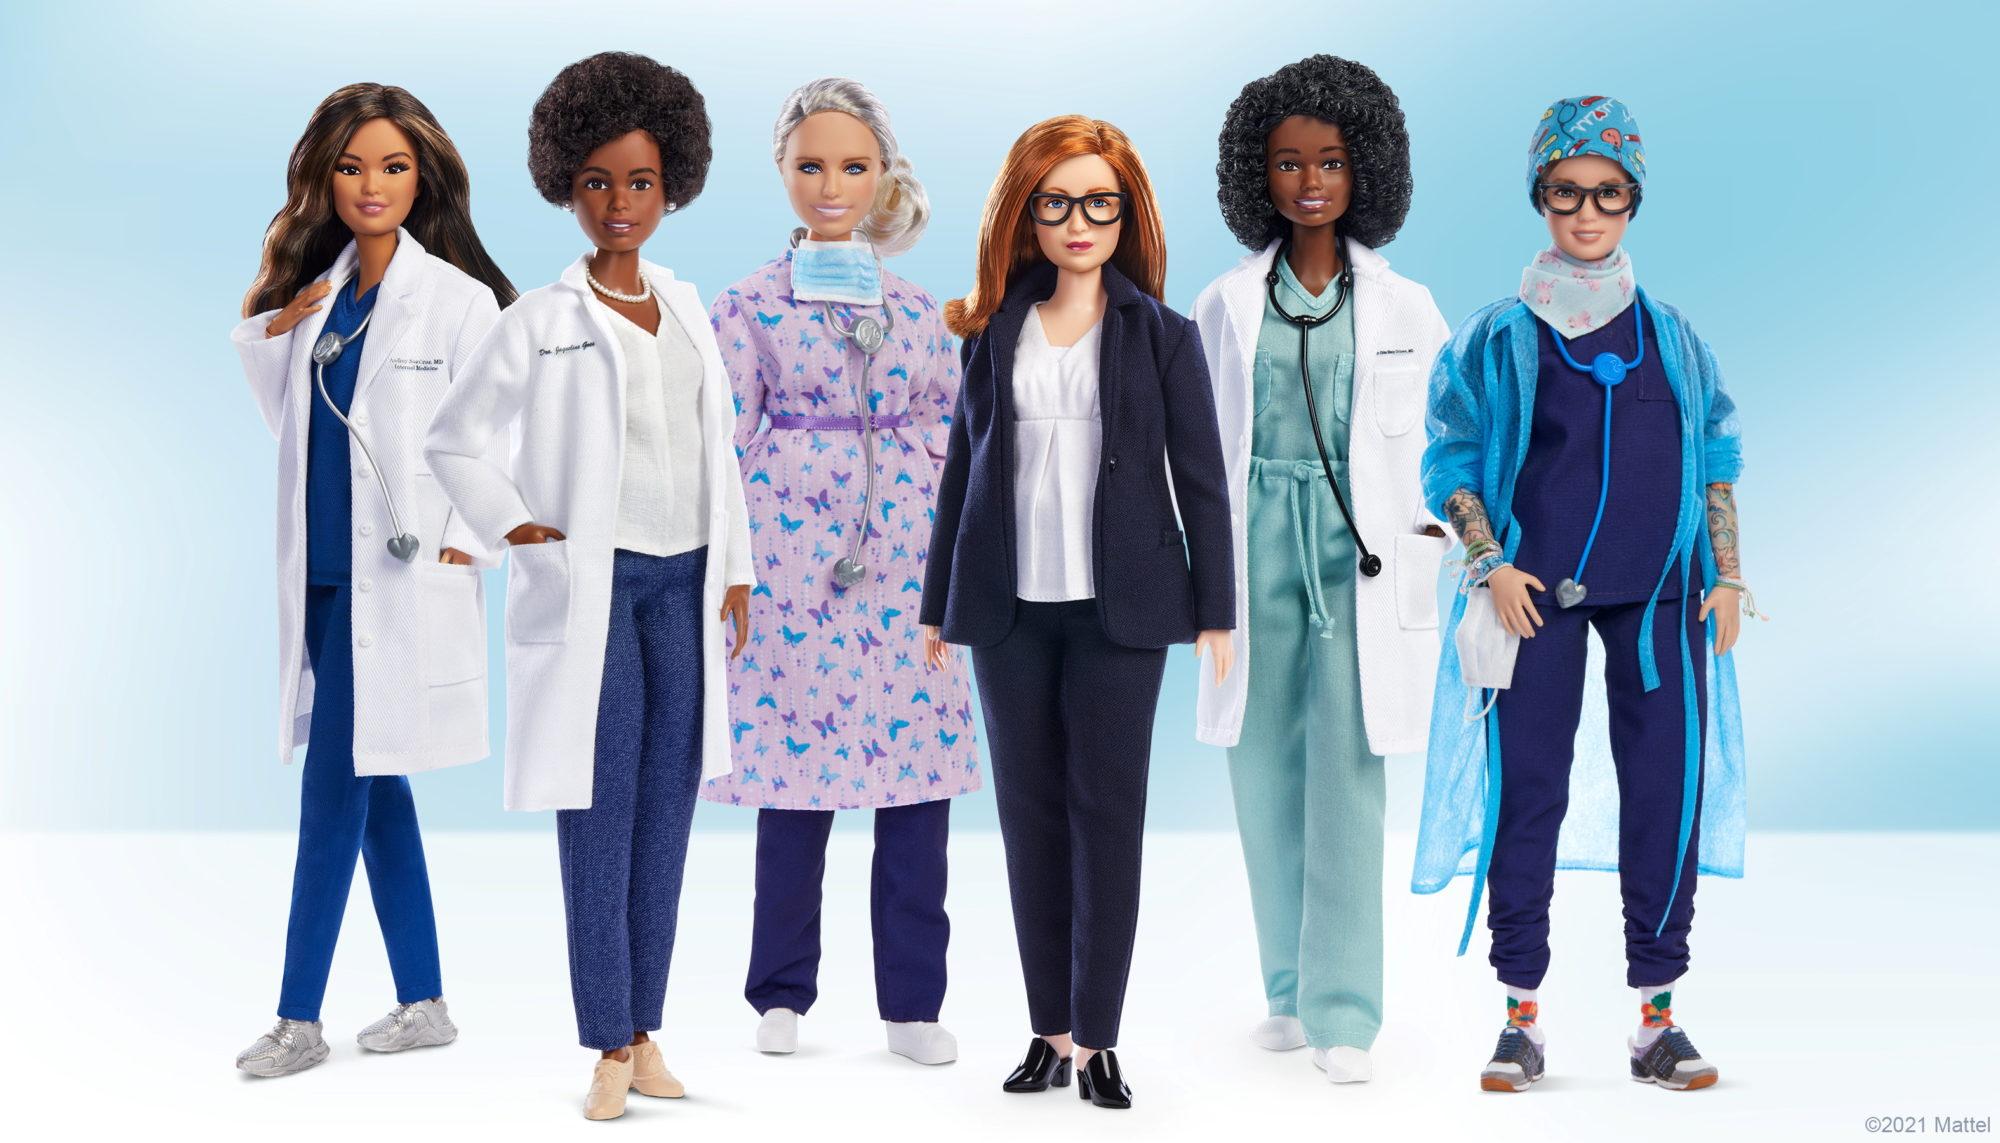 Oxford vaccine developer Gilbert has Barbie doll made in her likeness